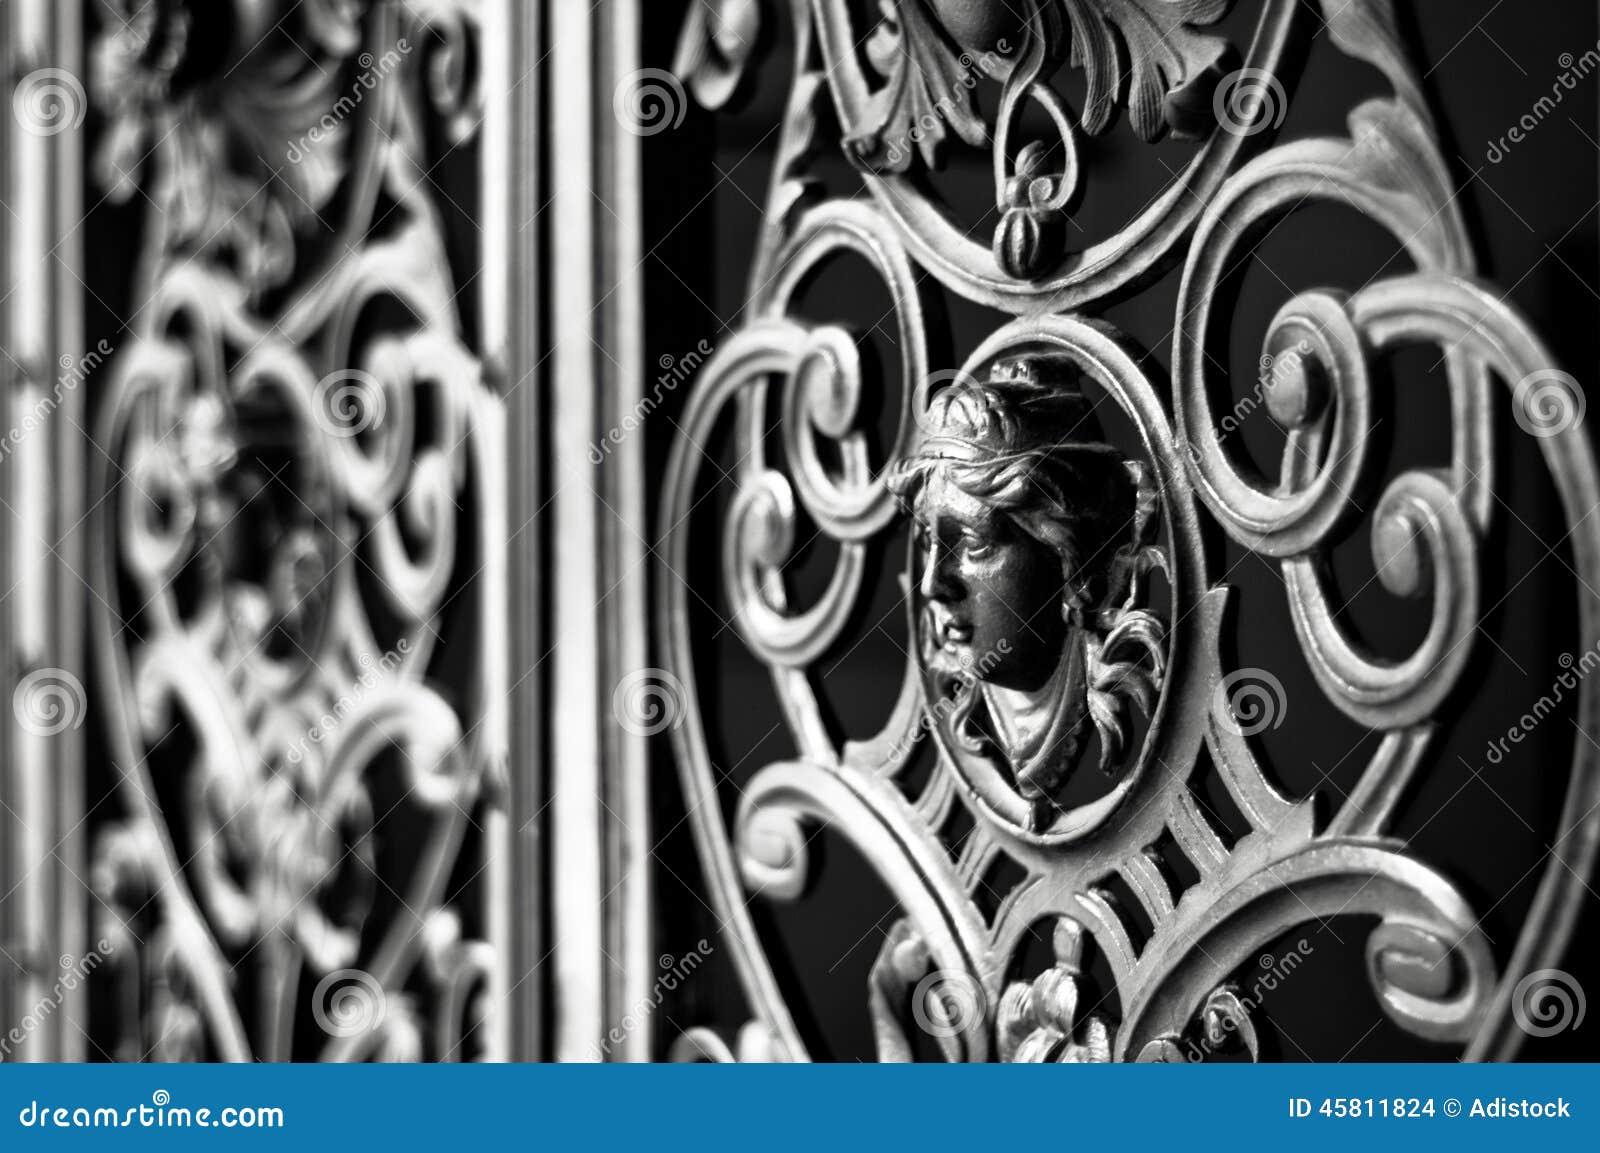 Decorative Metal Gate Photo Image 45811811 – Decorative Metal Garden Gates